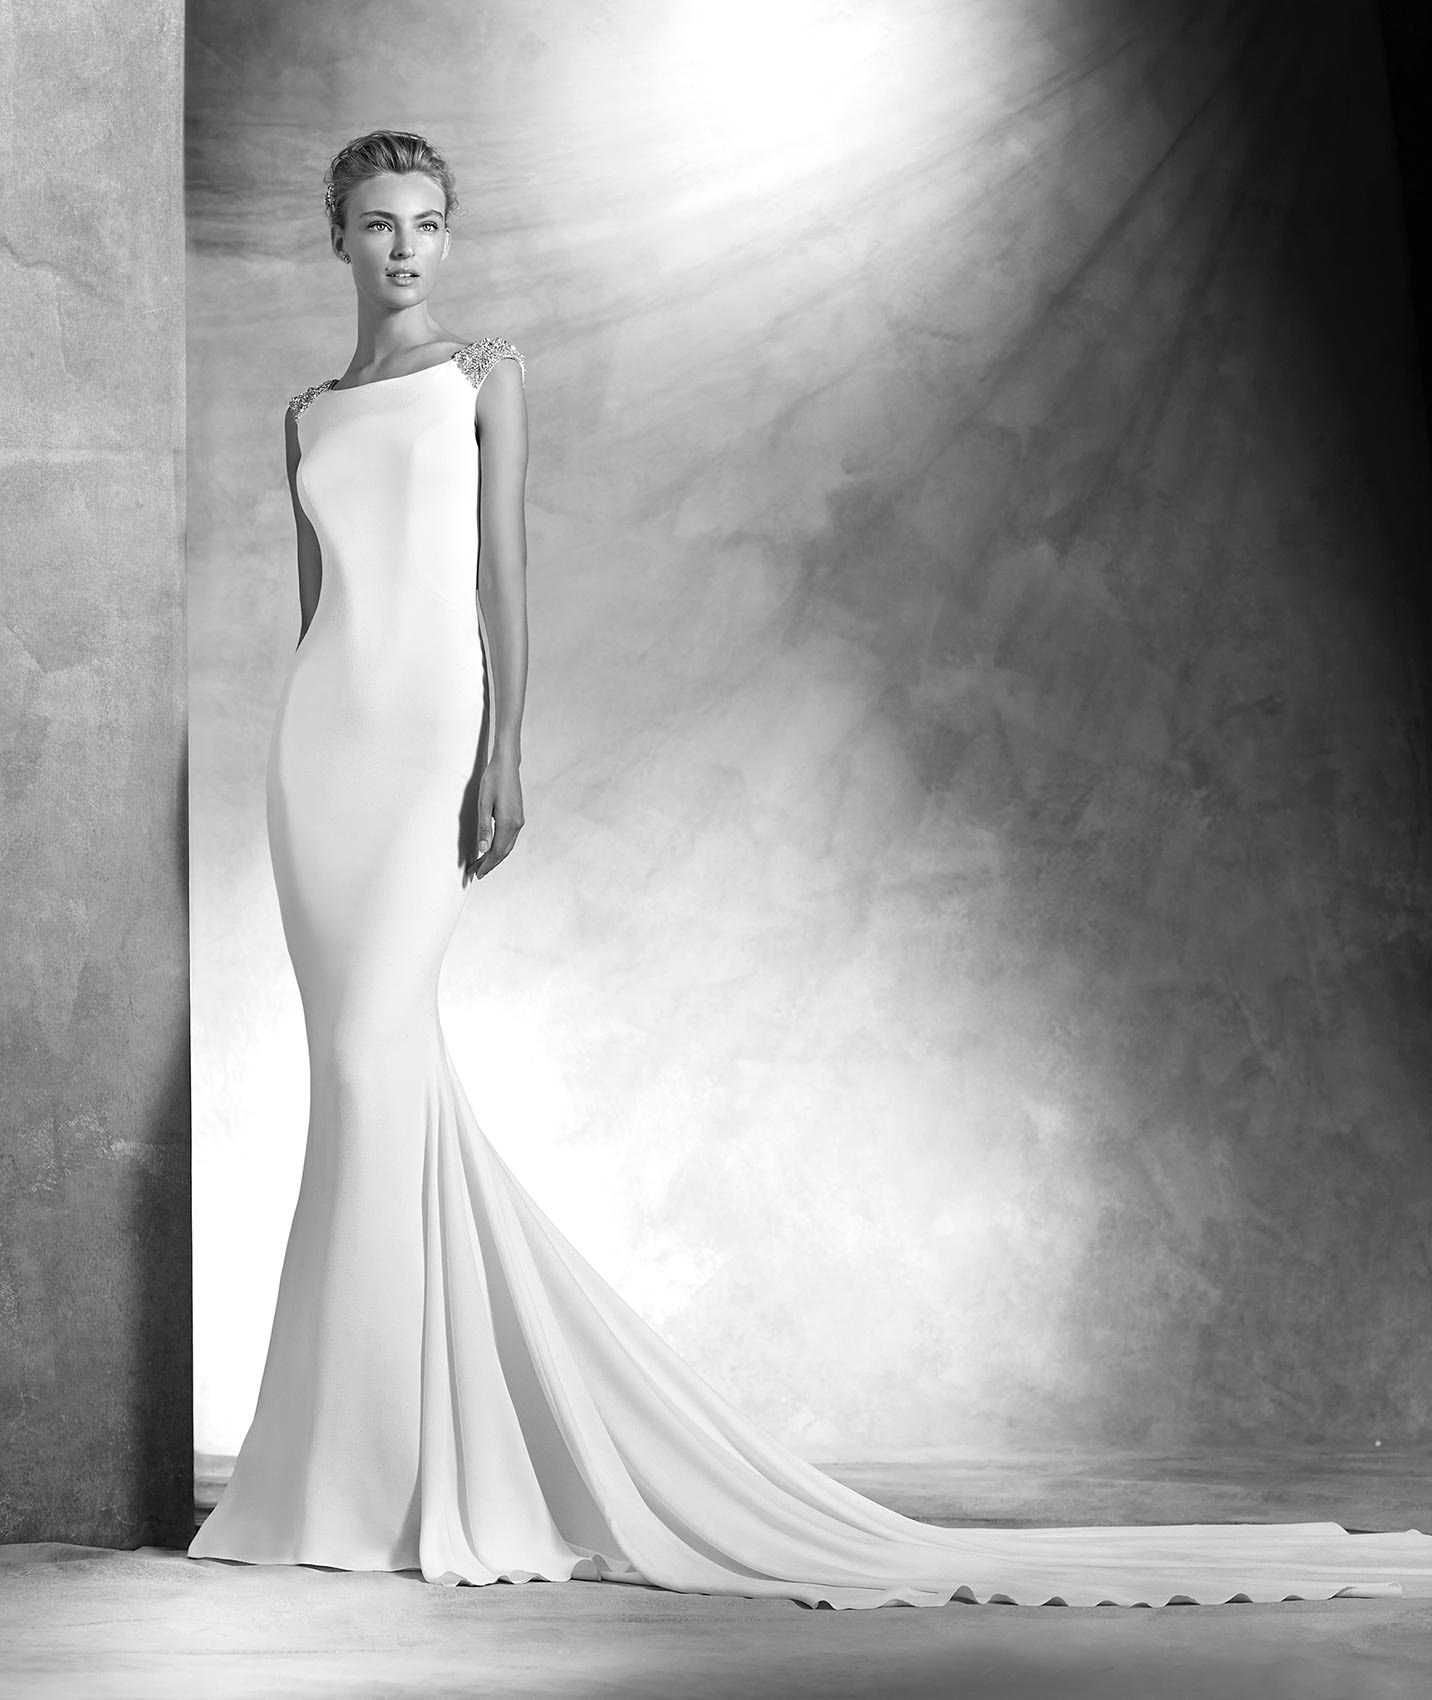 Vestido de novia lisos corte sirena